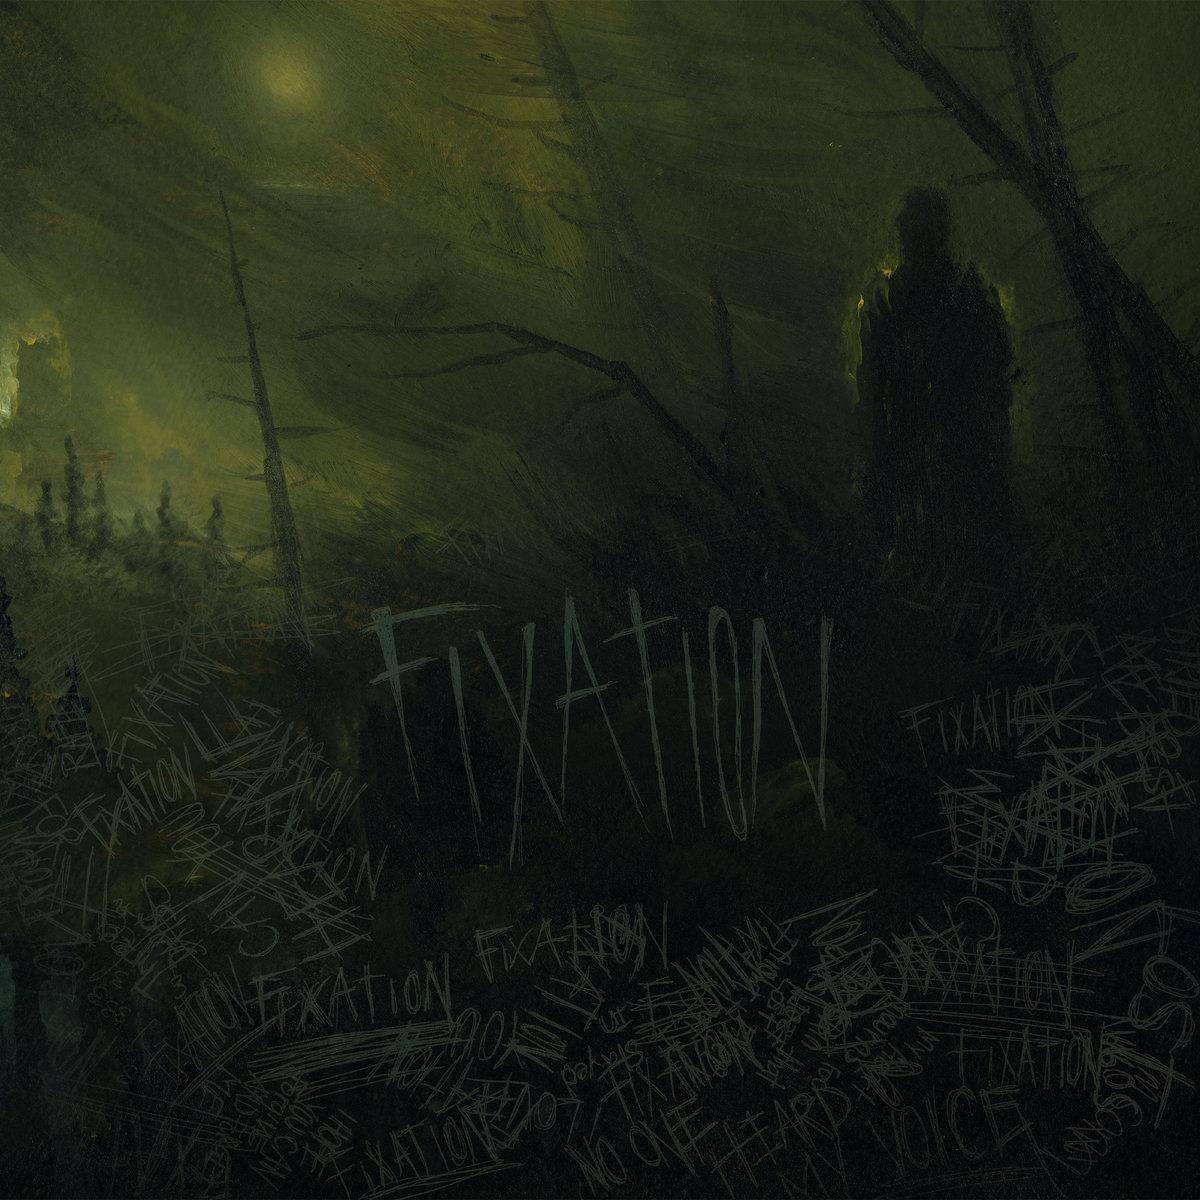 The Ember, The Ash Fixation Album Cover Artwork